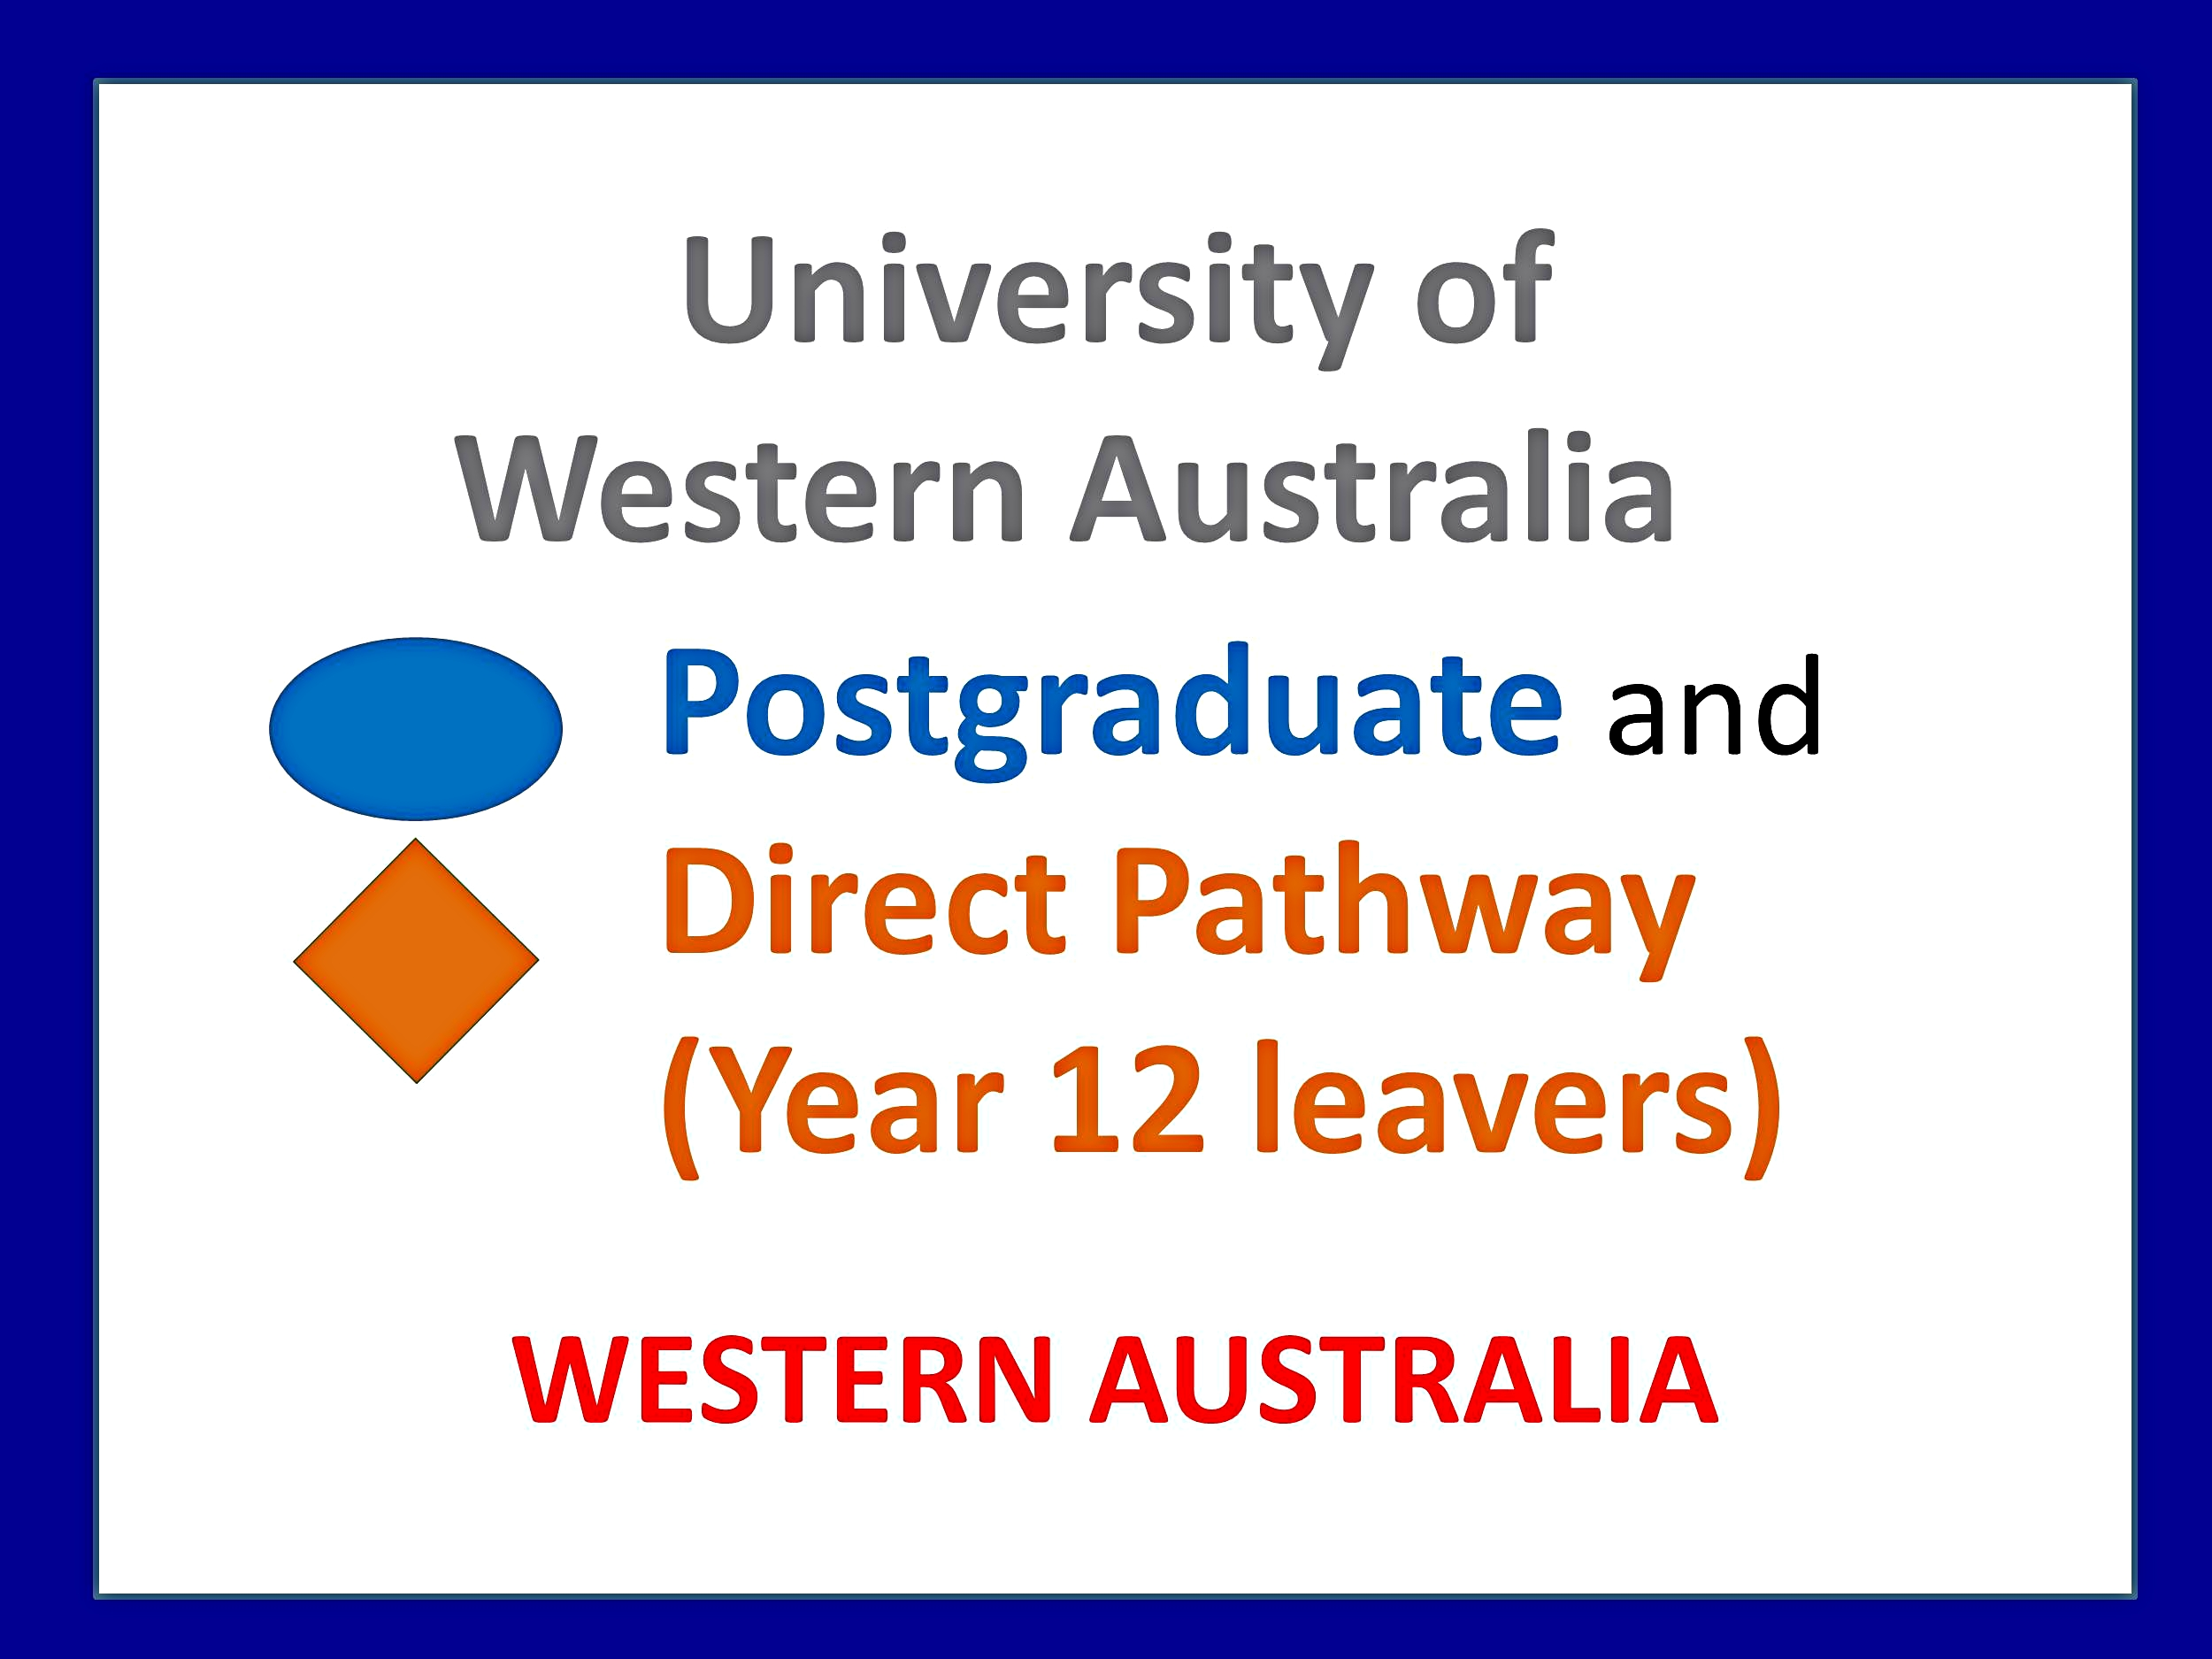 university of western australia medicine.jpg